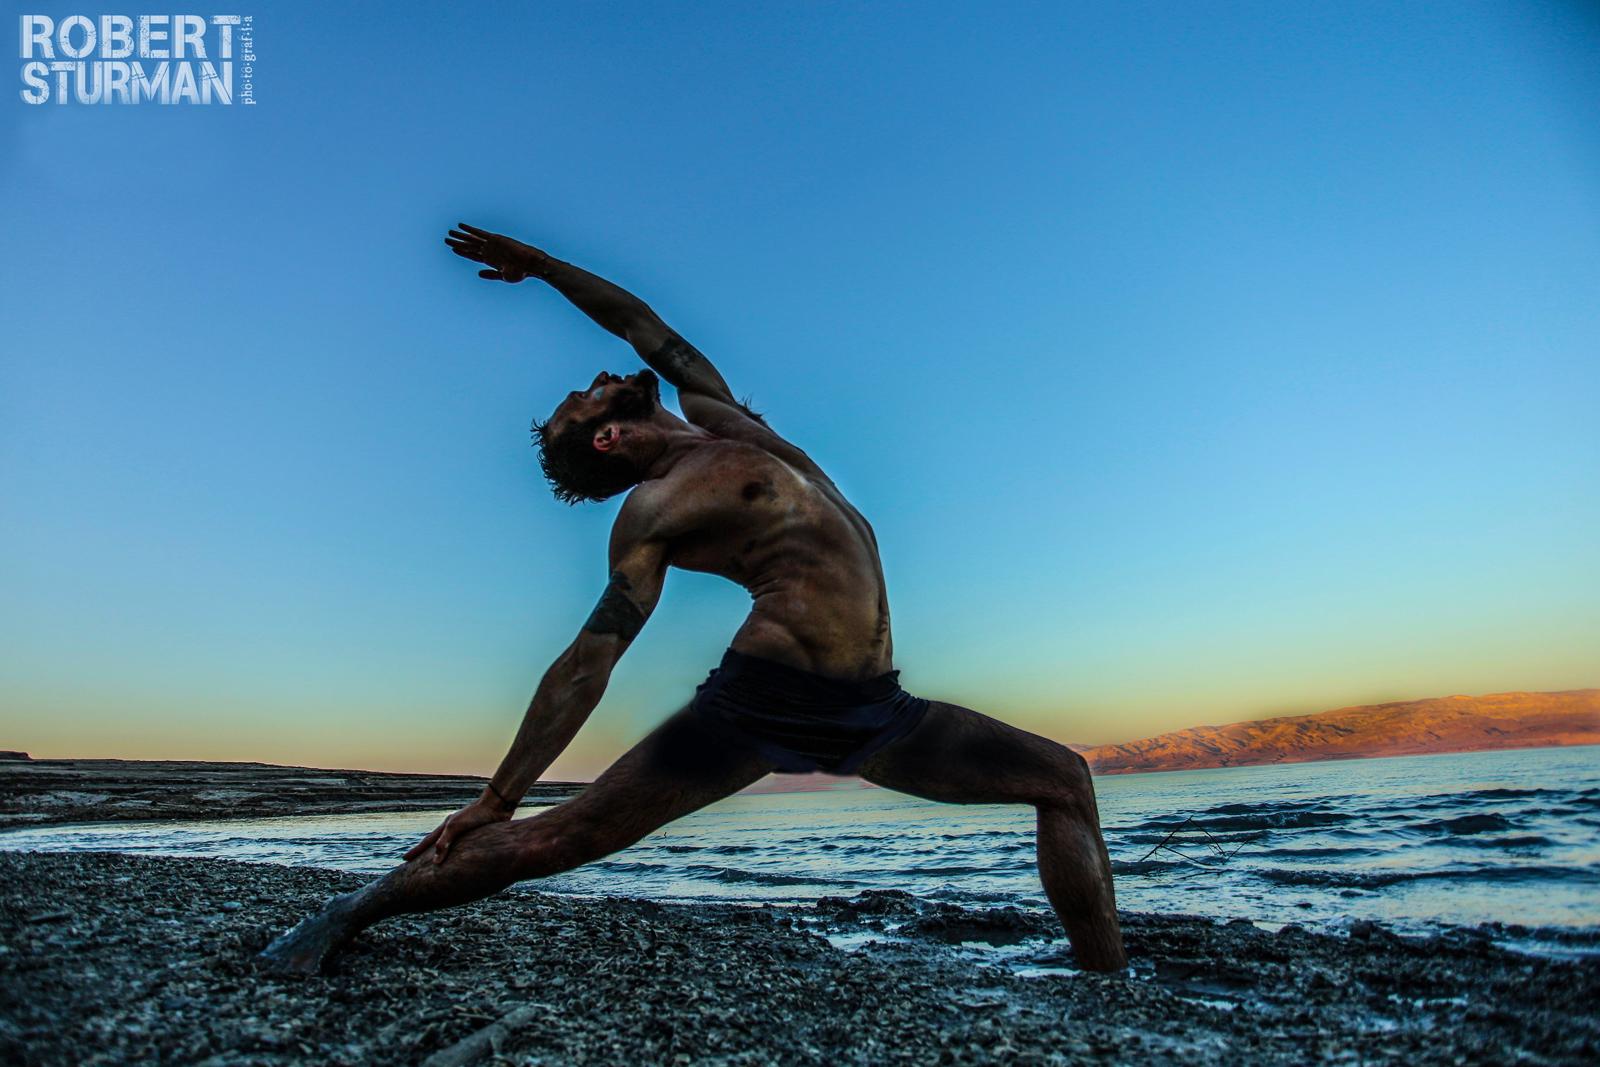 Udi Sahar doing yoga at sundown at the Dead Sea. Photo by Robert Sturman